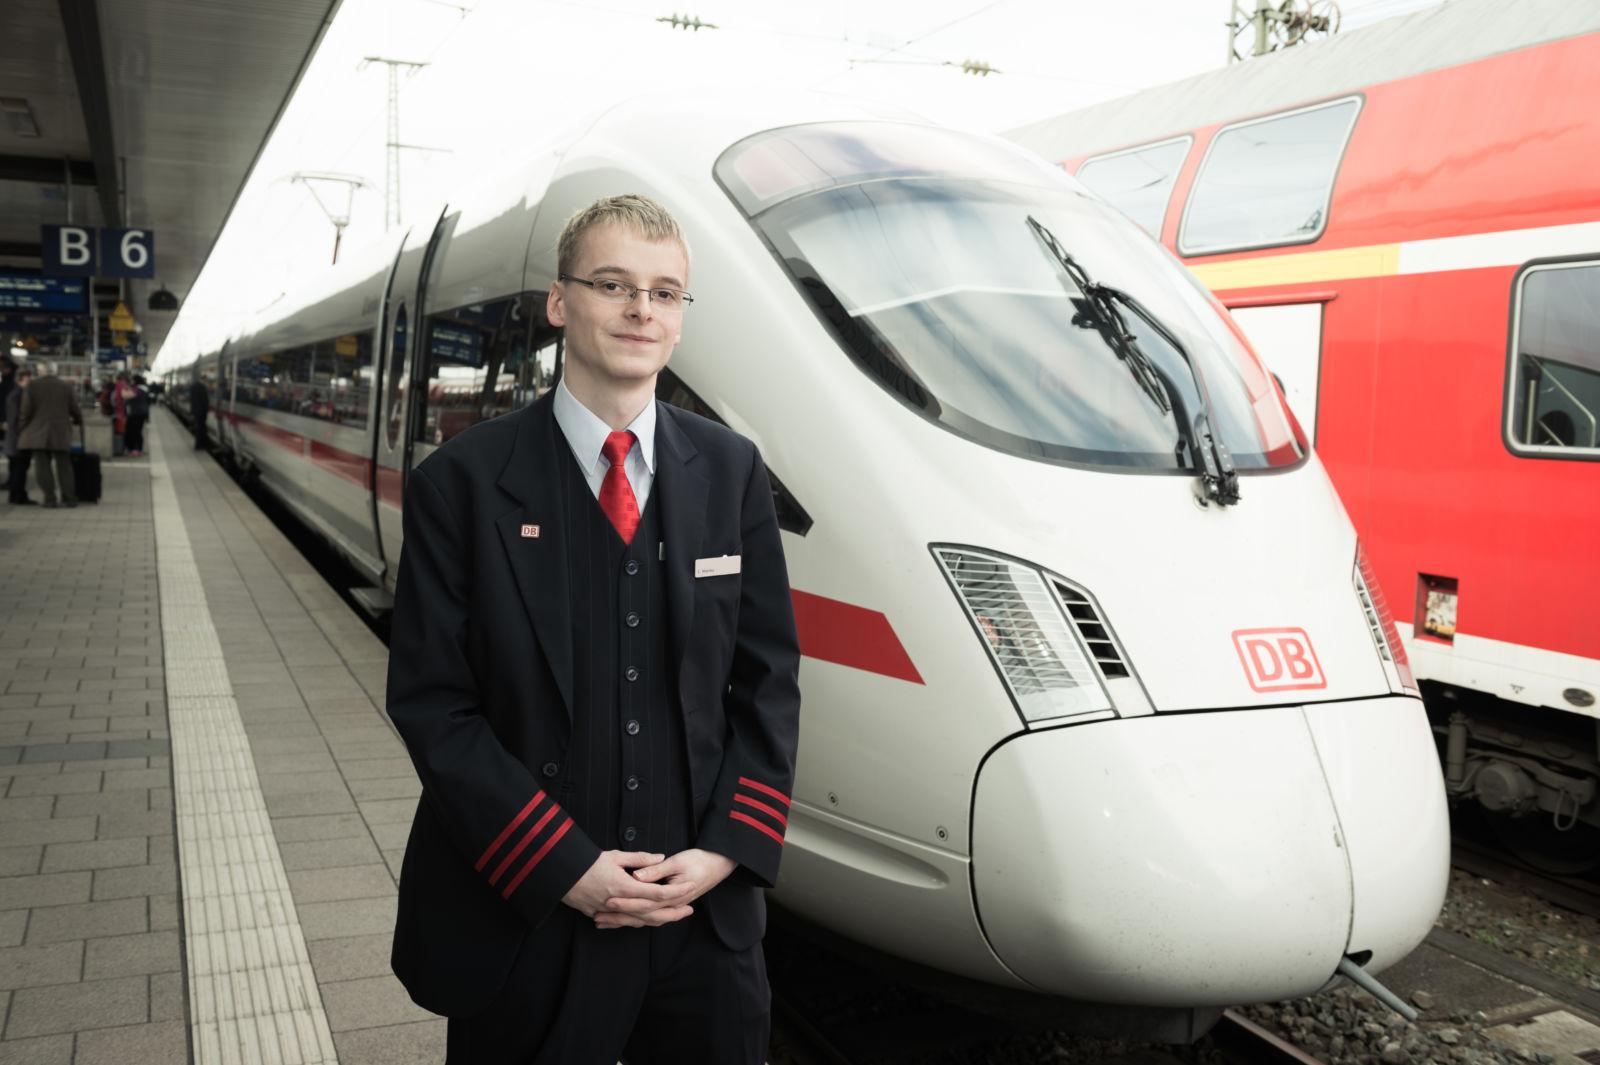 Eisenbahner mit Herz 2017 Christian Mainka